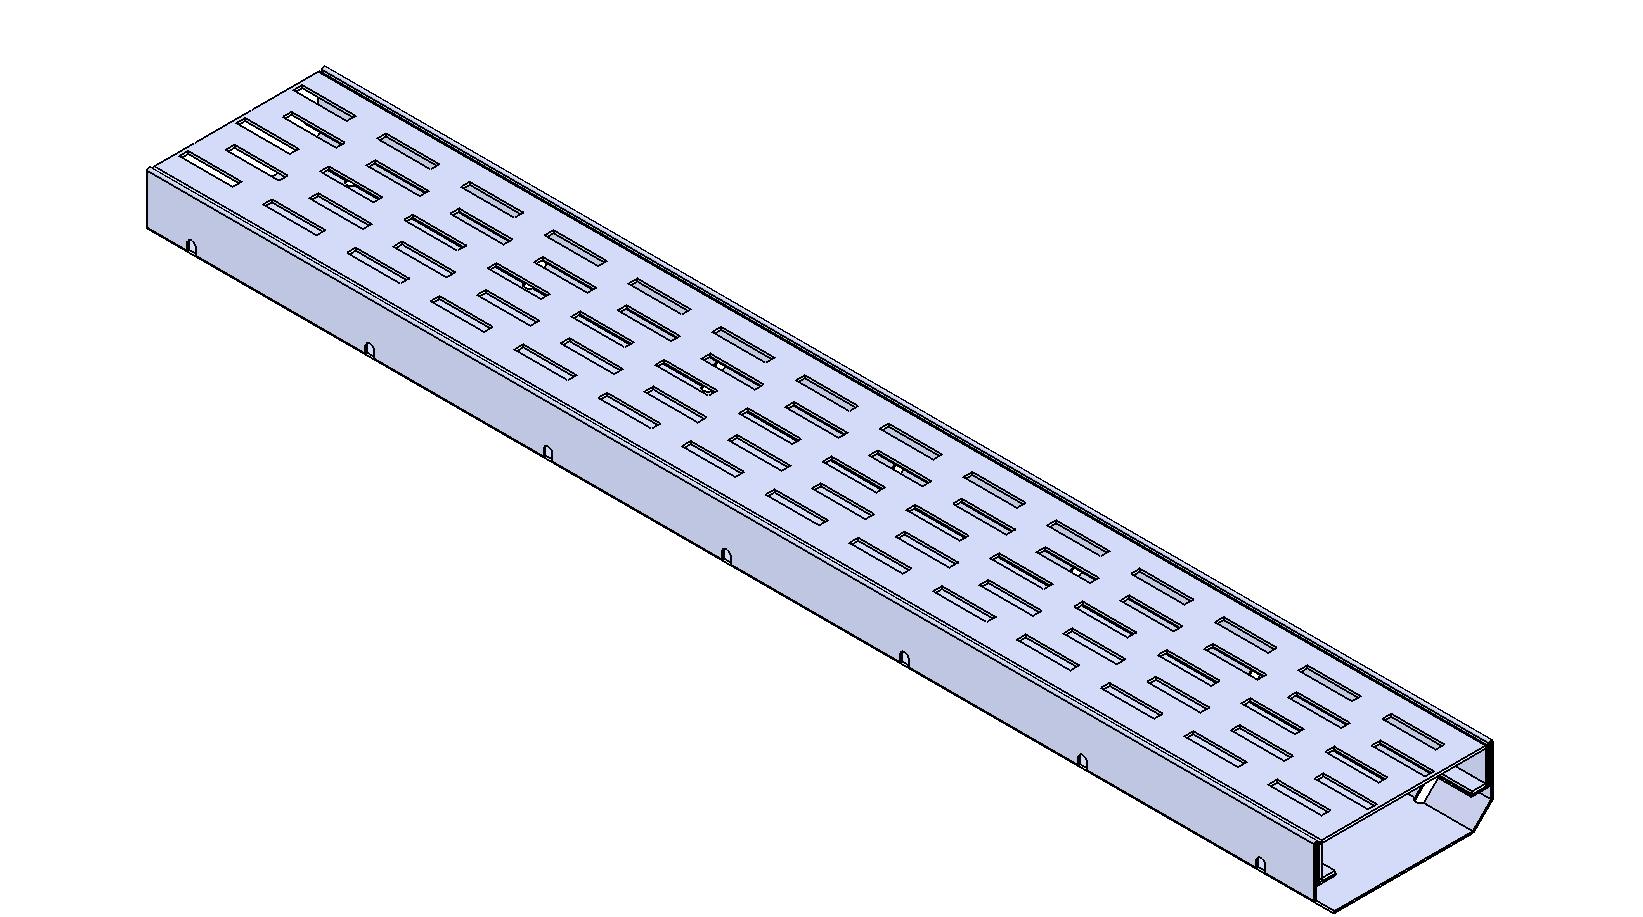 FD001-FD 100 40.JPG